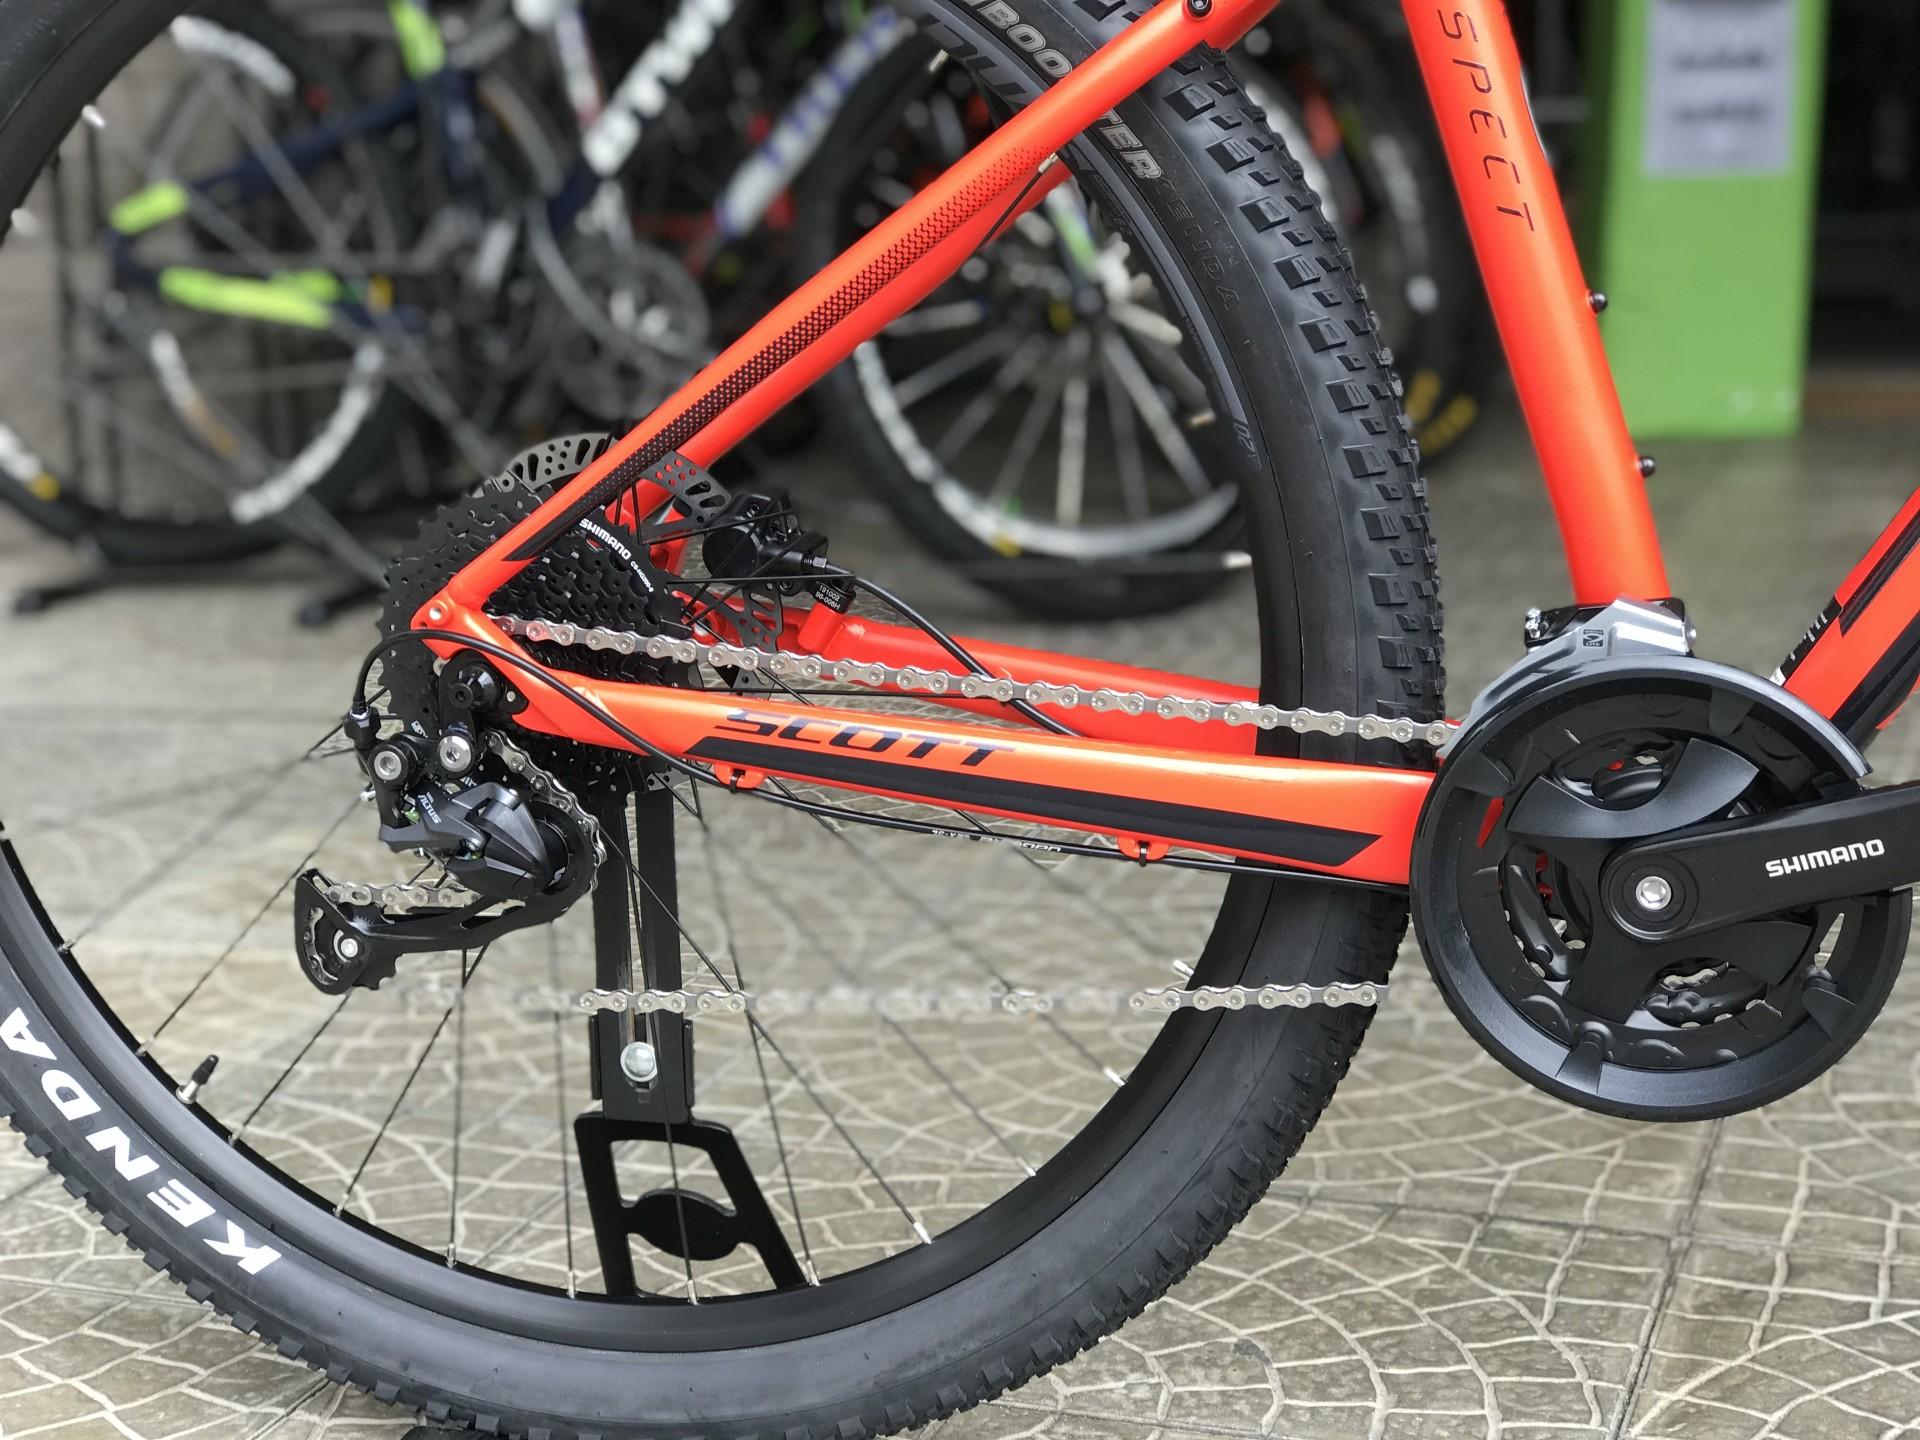 Bicicleta Scott Aspect 950 - 2020 (vermelha)